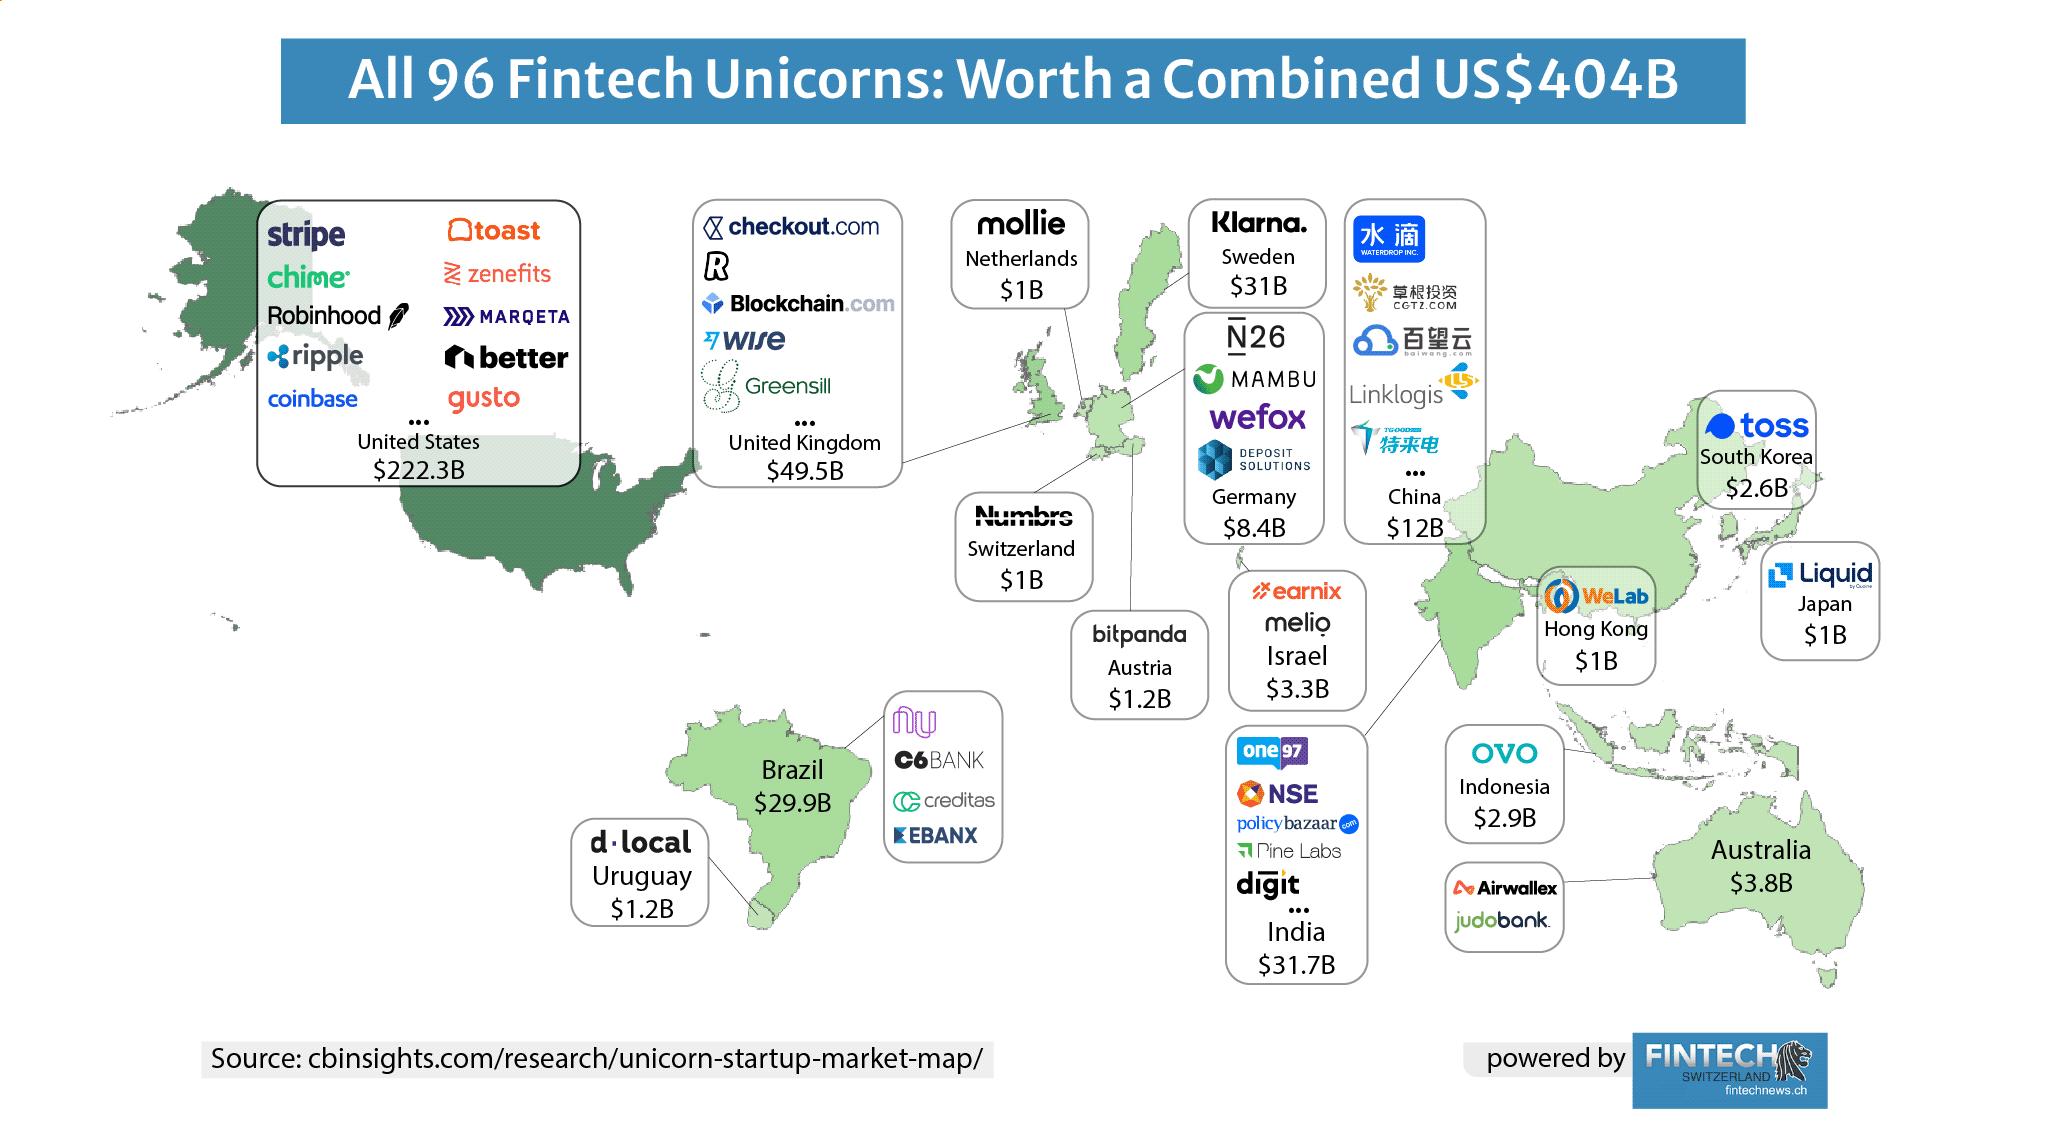 All 96 Fintech Unicorns - Worth Combined US 404 billion